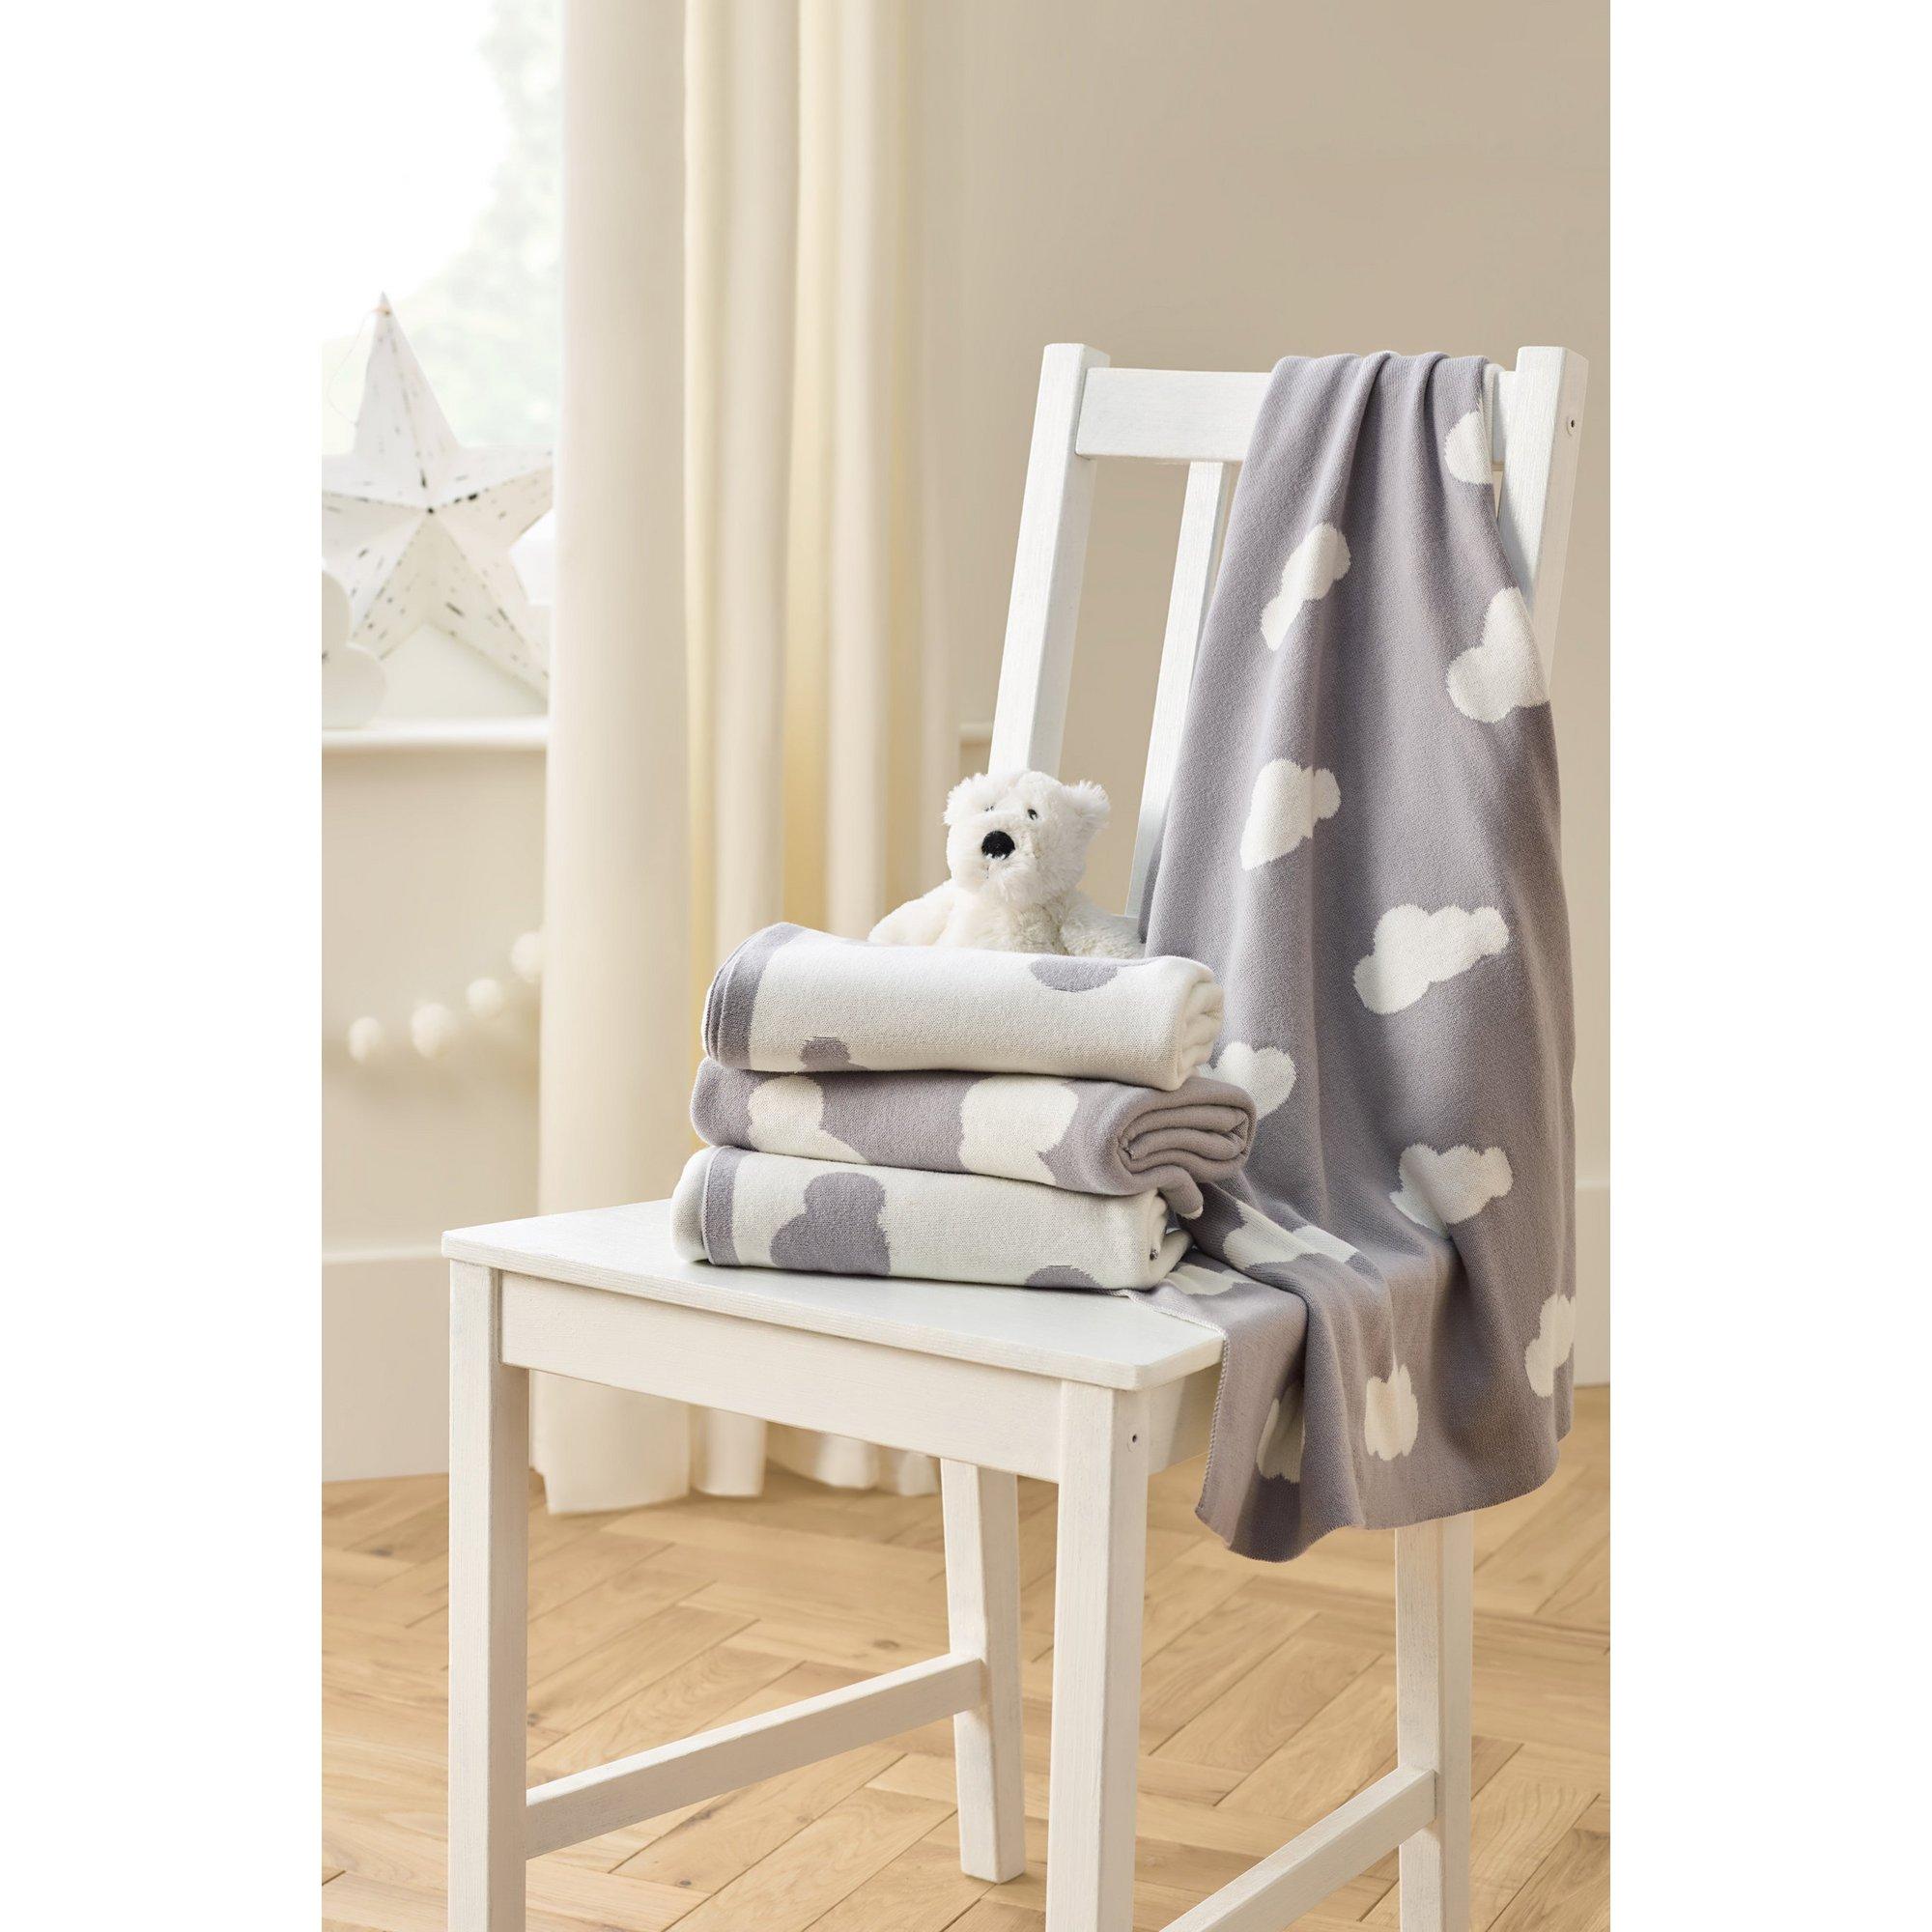 Image of Clair de Lune Cloud Blanket